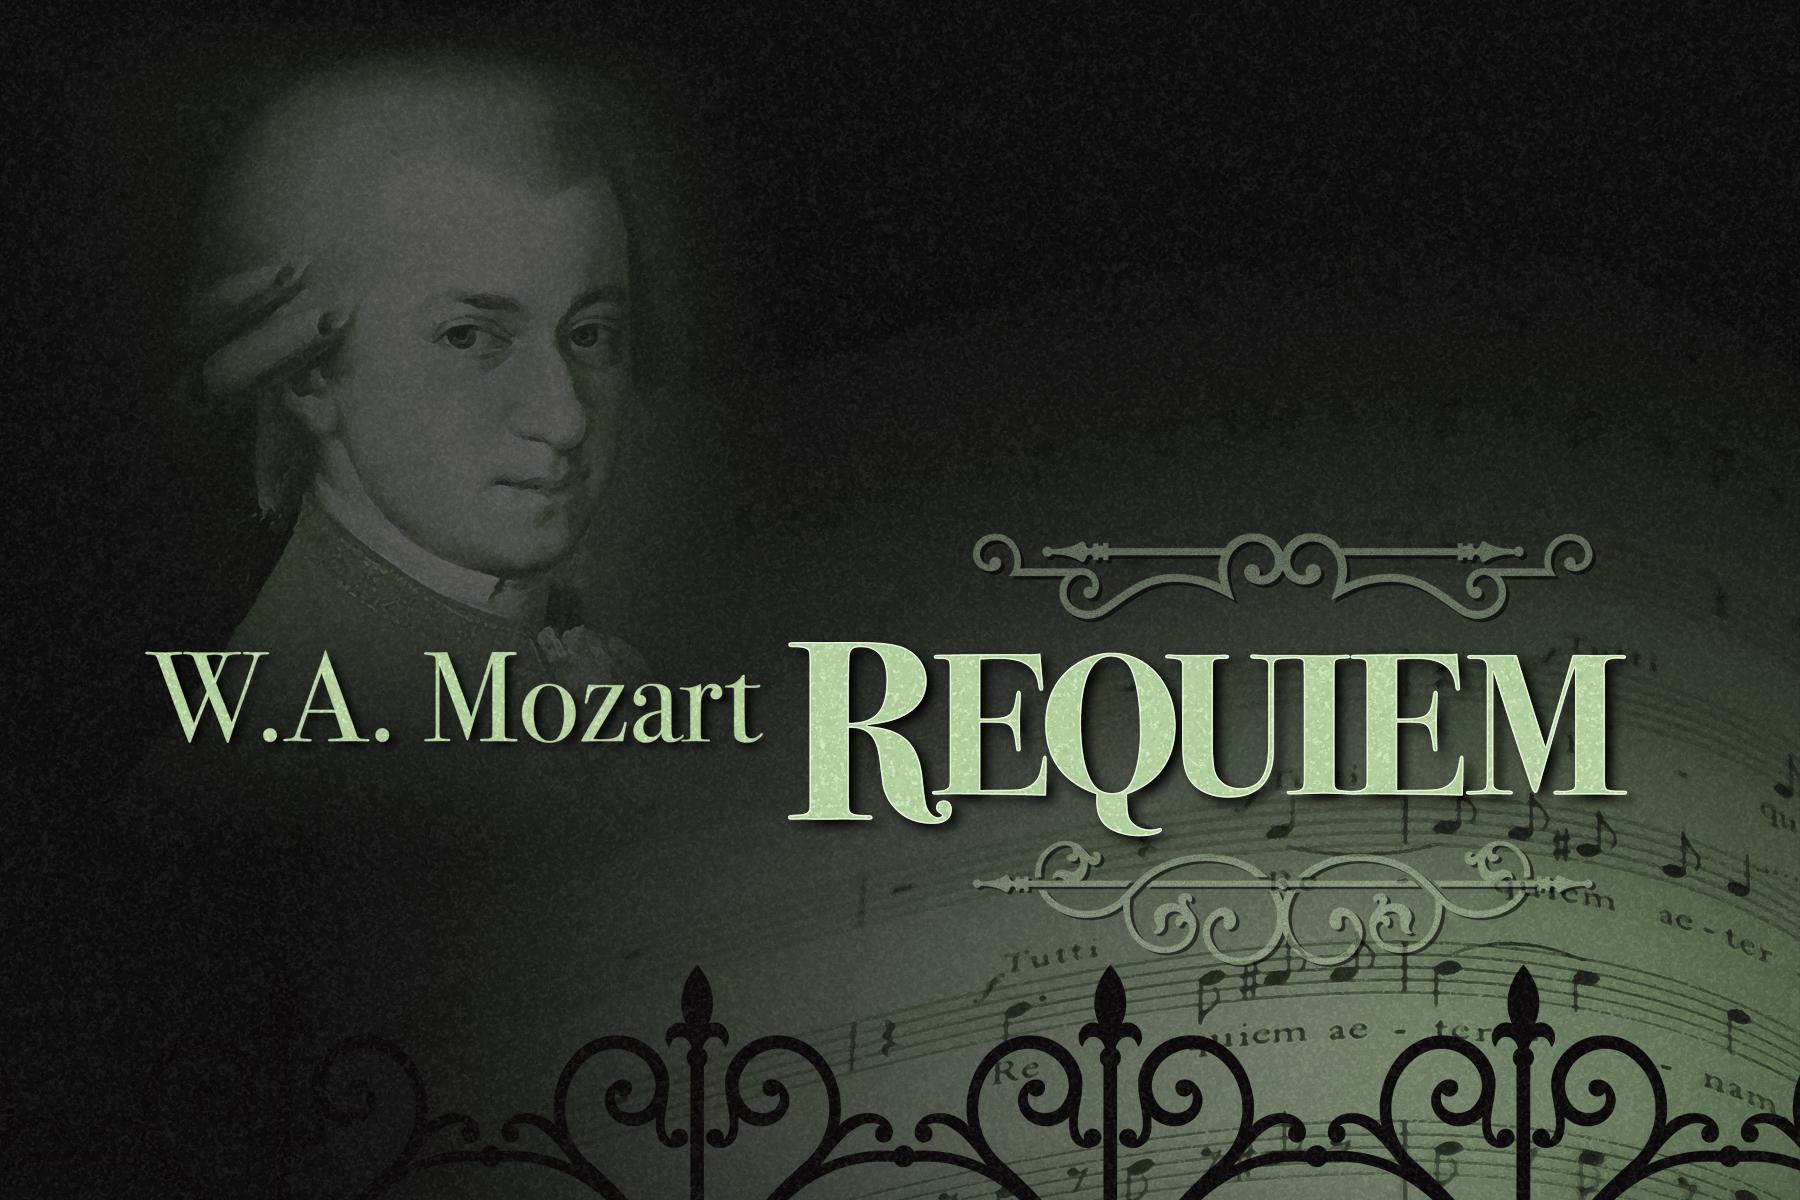 Herbert von karajan / mozart: requiem in d minor, k 626 (wolfgang amadeus mozart) hybrid multichannel / stereo